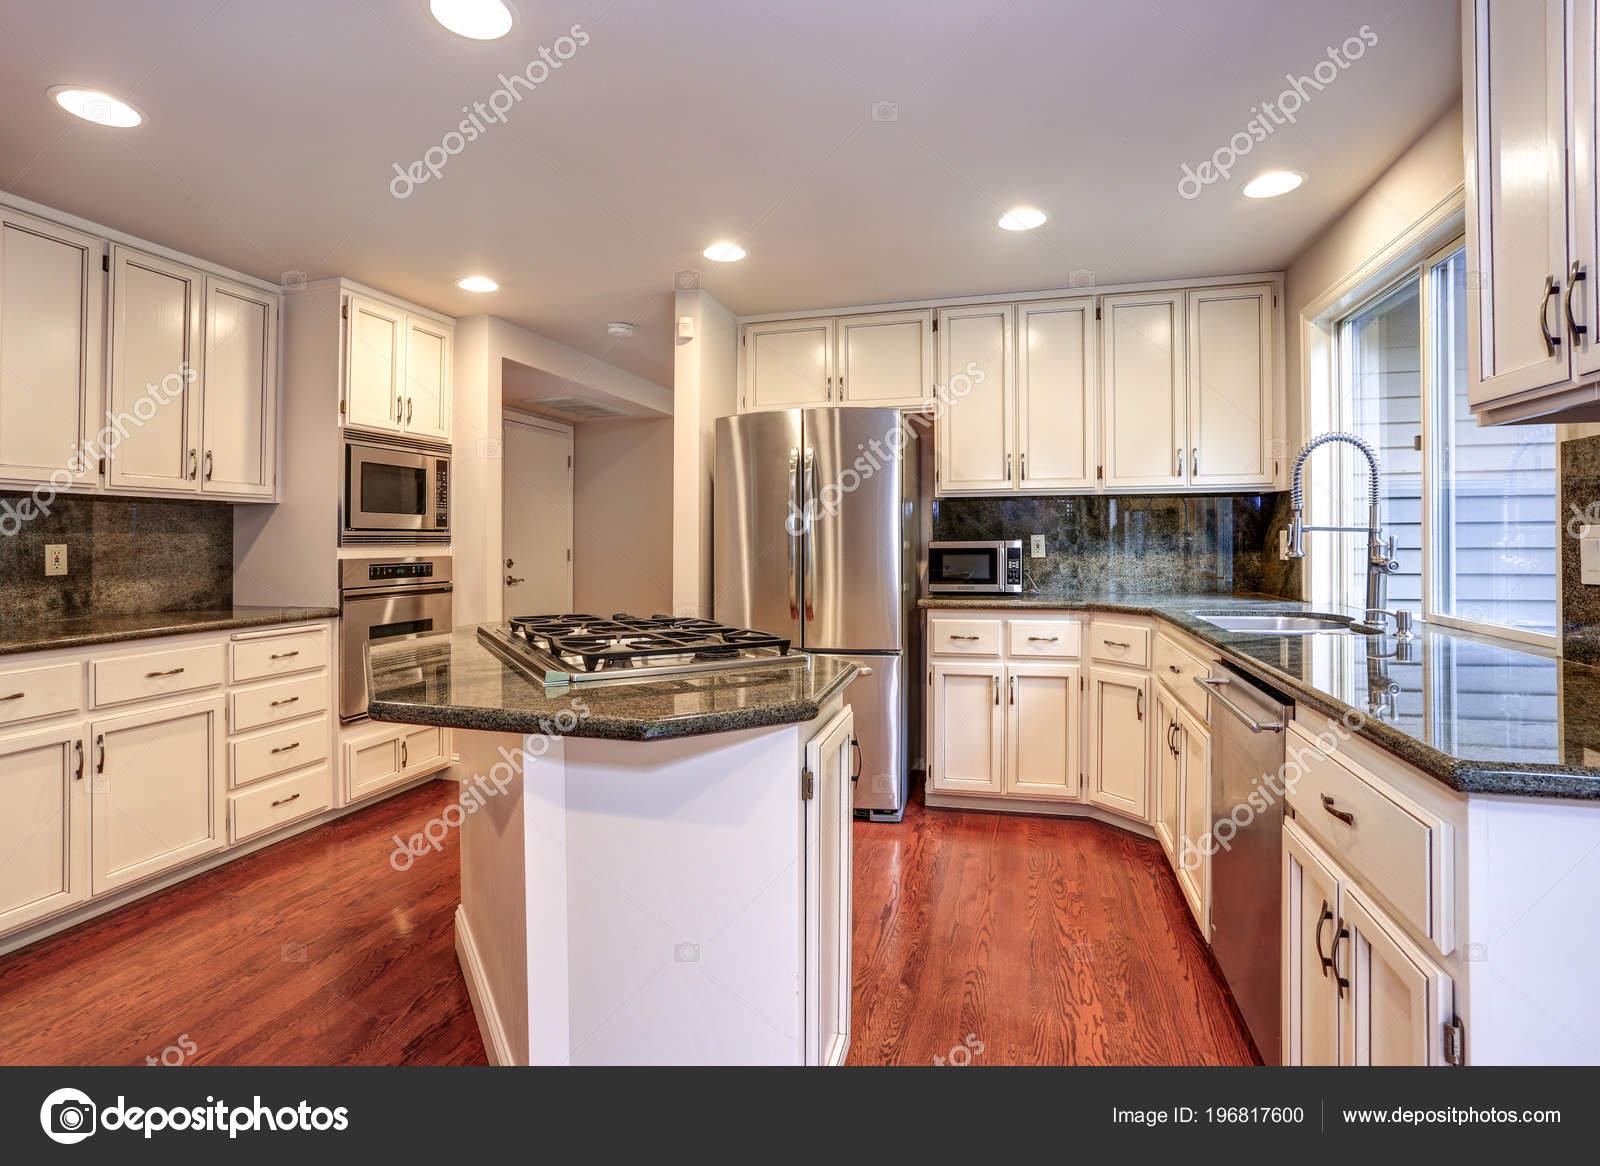 kitchen pantries ninja professional system 1500 白色厨房房间拥有不锈钢用具花岗岩柜台走进茶水间海岛与气体烹调顶部和 白色厨房房间拥有不锈钢用具花岗岩柜台走进茶水间海岛与气体烹调